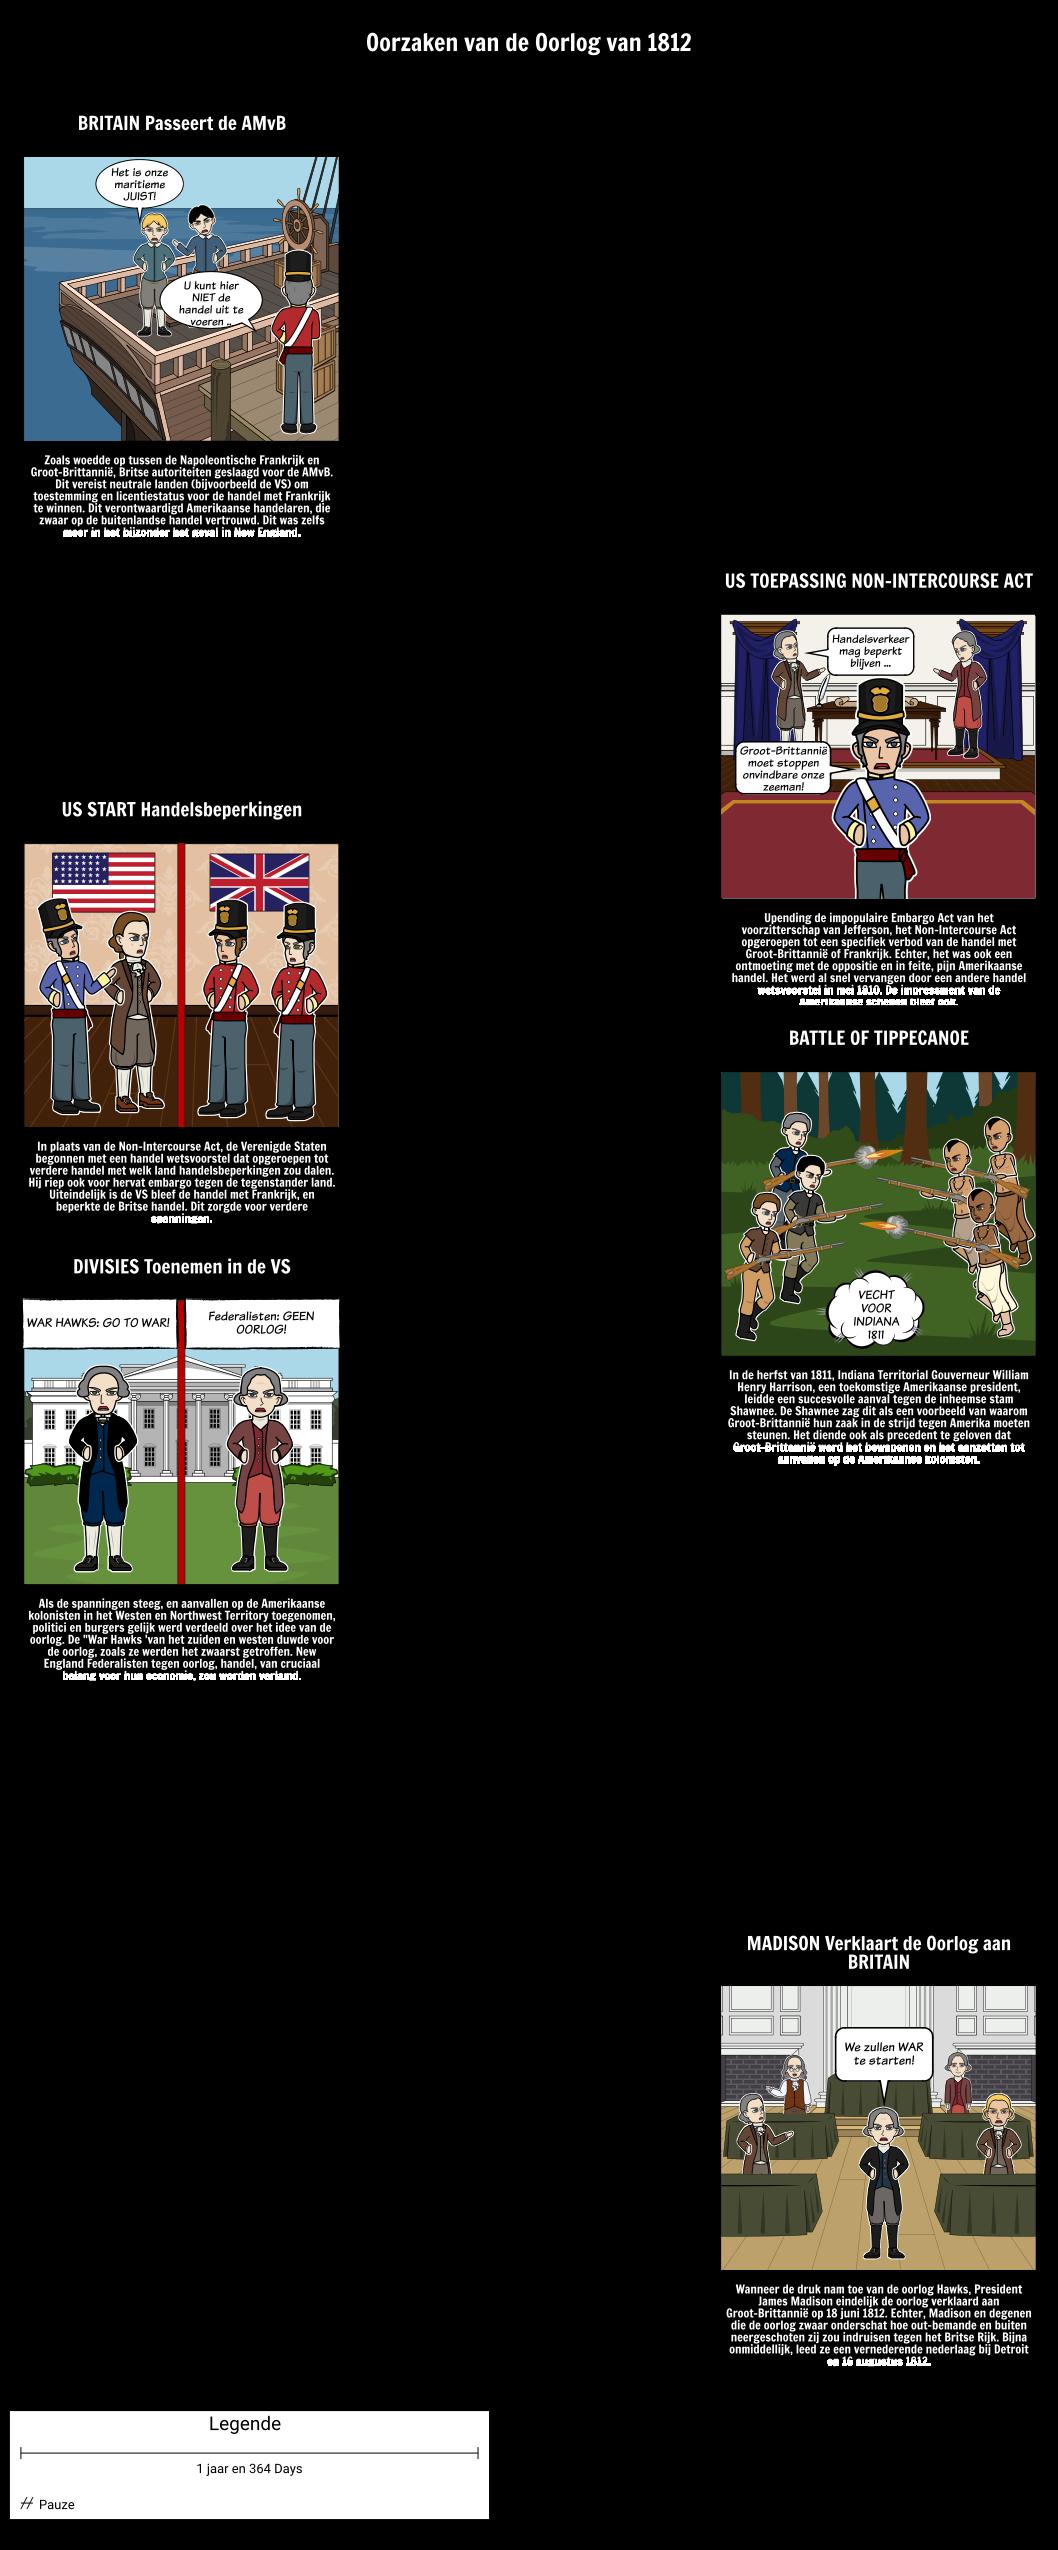 Oorlog van 1812 - Oorzaken van de Oorlog van 1812 Timeline